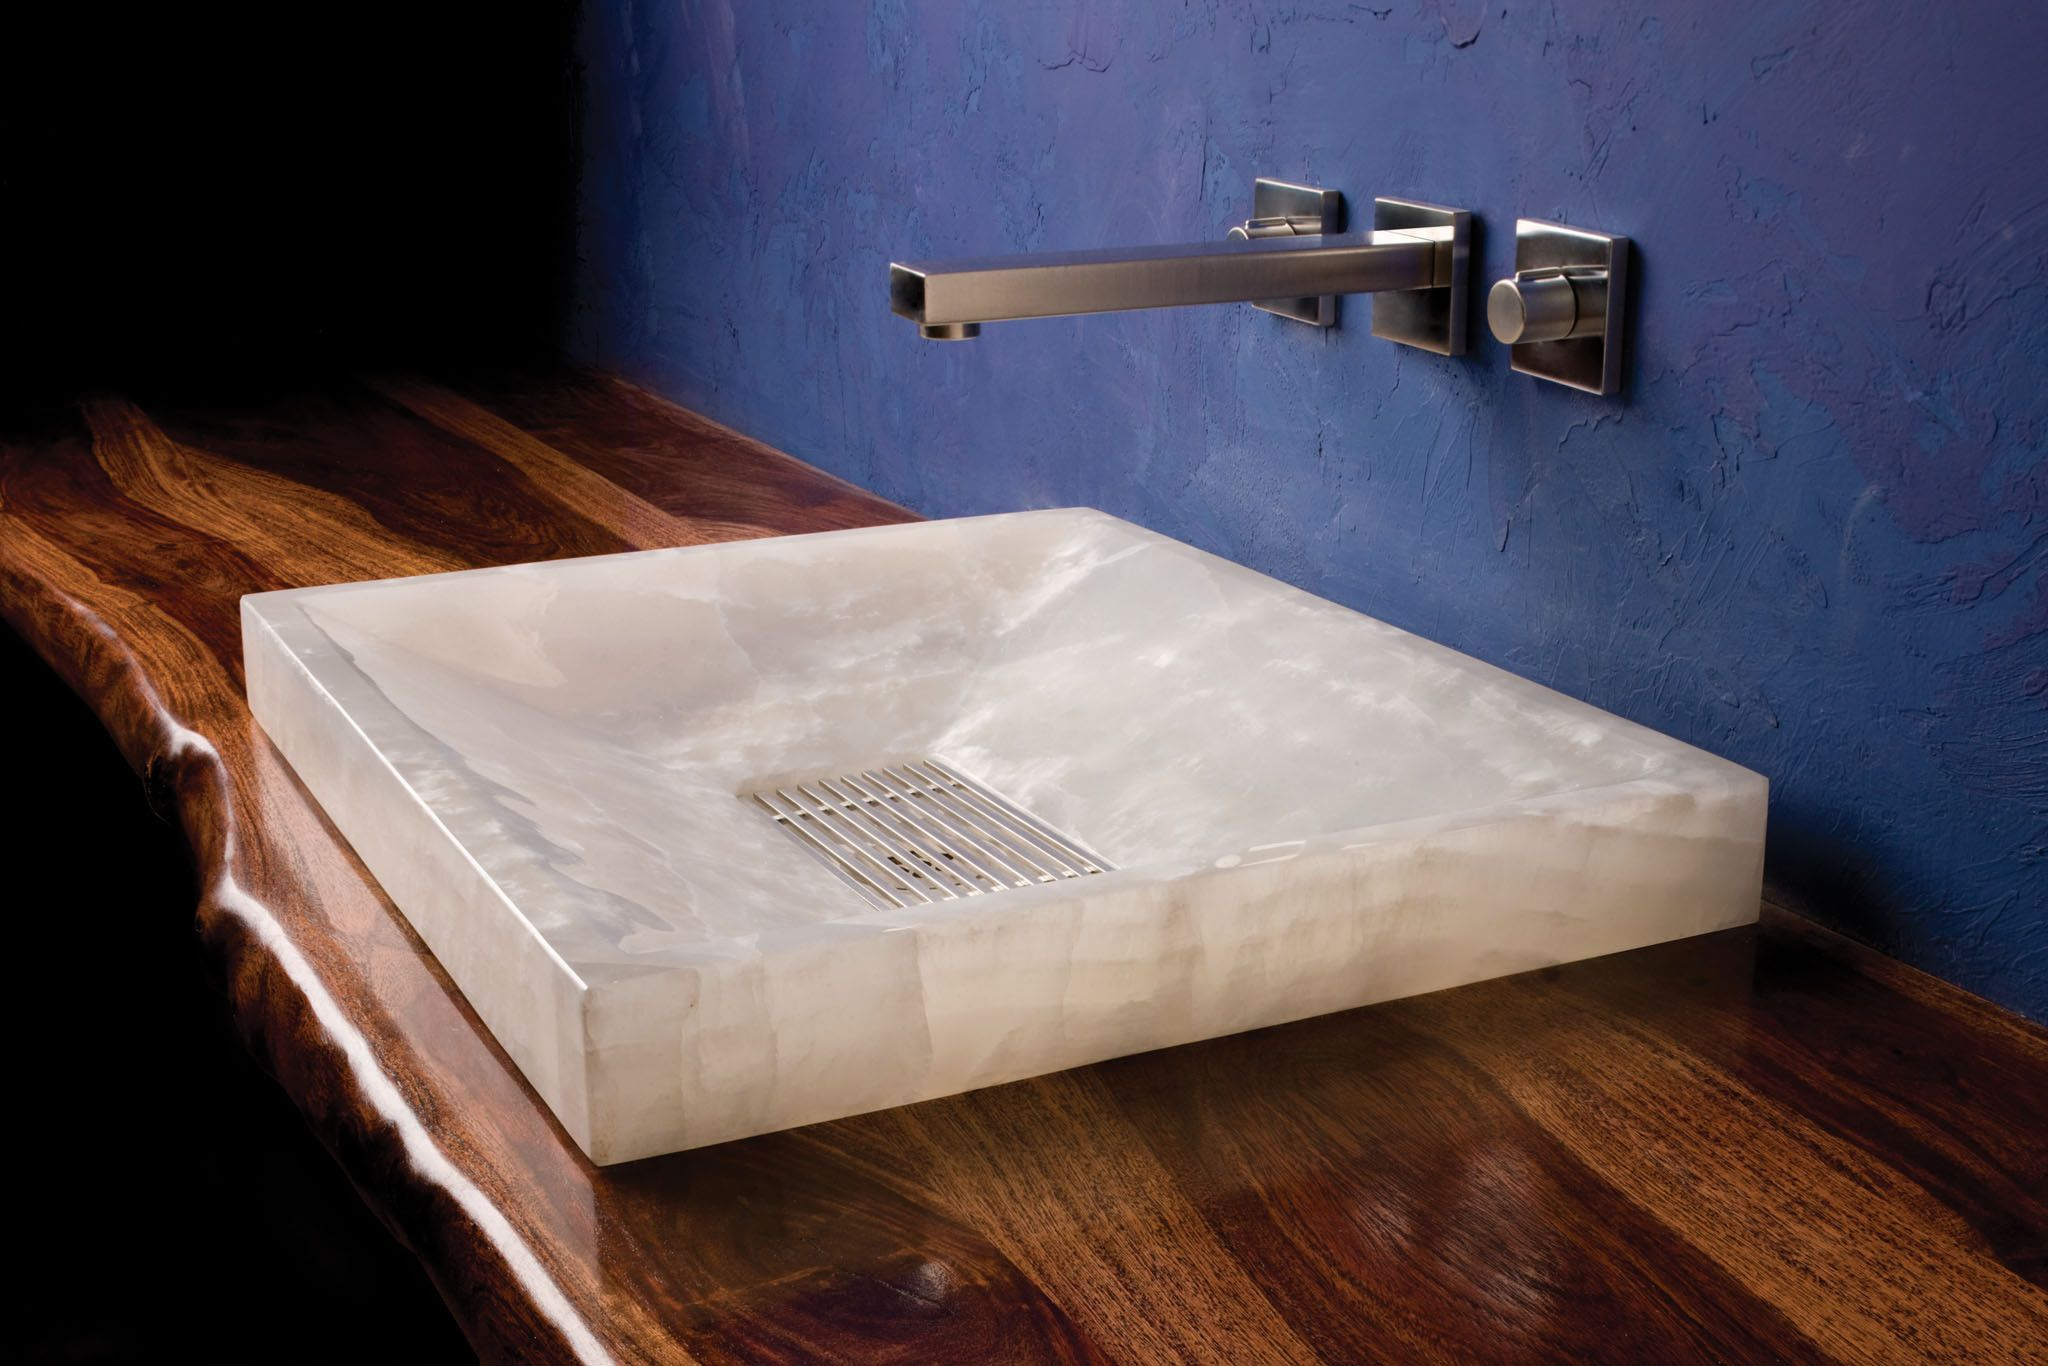 SYNC Drop in Vessel Sink – Stone Forest bath ideas